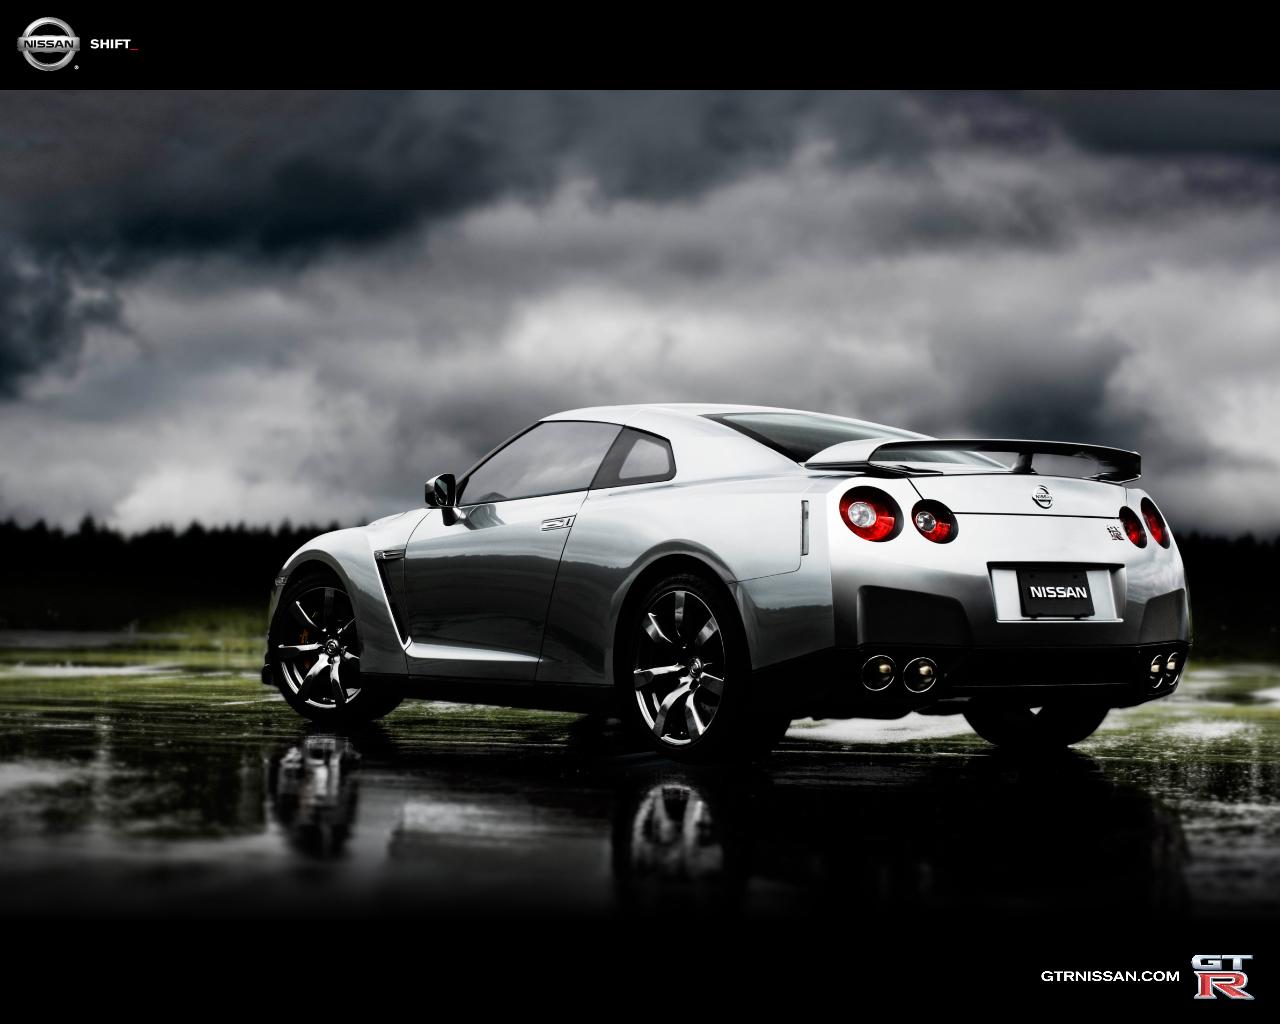 http://3.bp.blogspot.com/-gBsMvdLc88w/UHWYsdM7BDI/AAAAAAAAEgA/oWClOcw-ojw/s1600/Nissan-GTR-Wallpaper-5.jpg